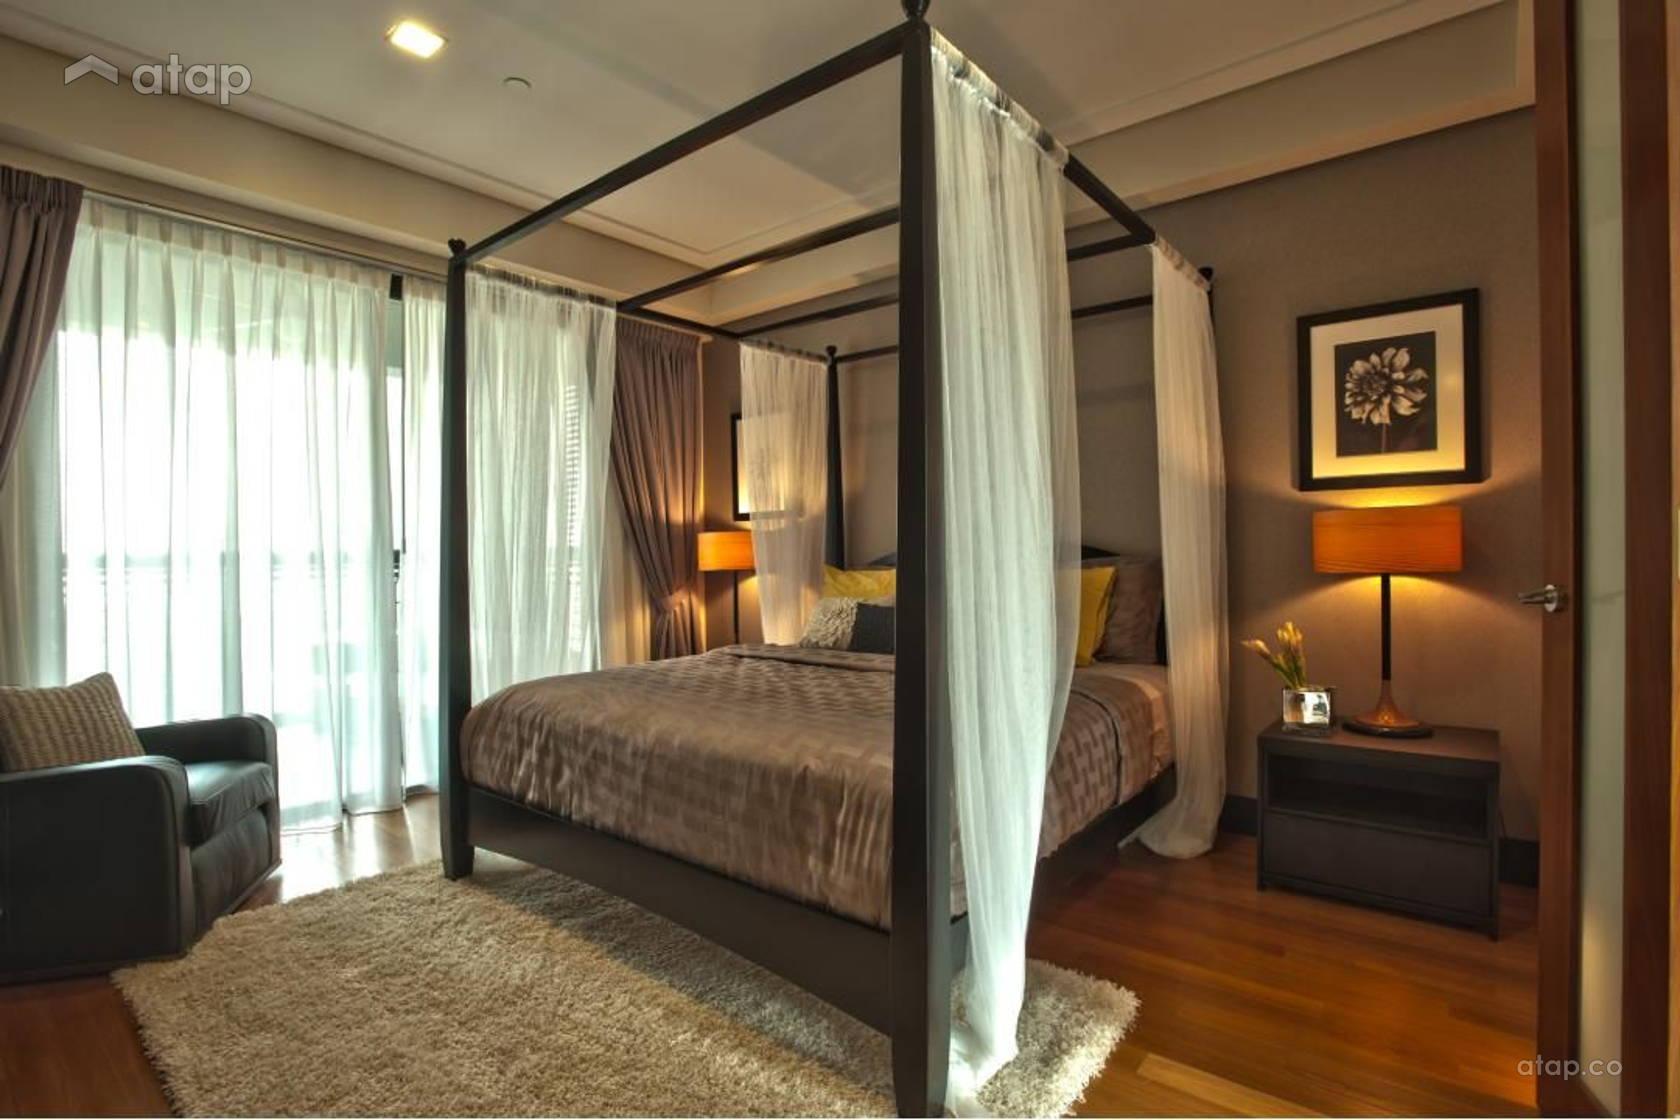 Binjai On The Park Interior Design Renovation Ideas Photos And Price In Malaysia Atap Co